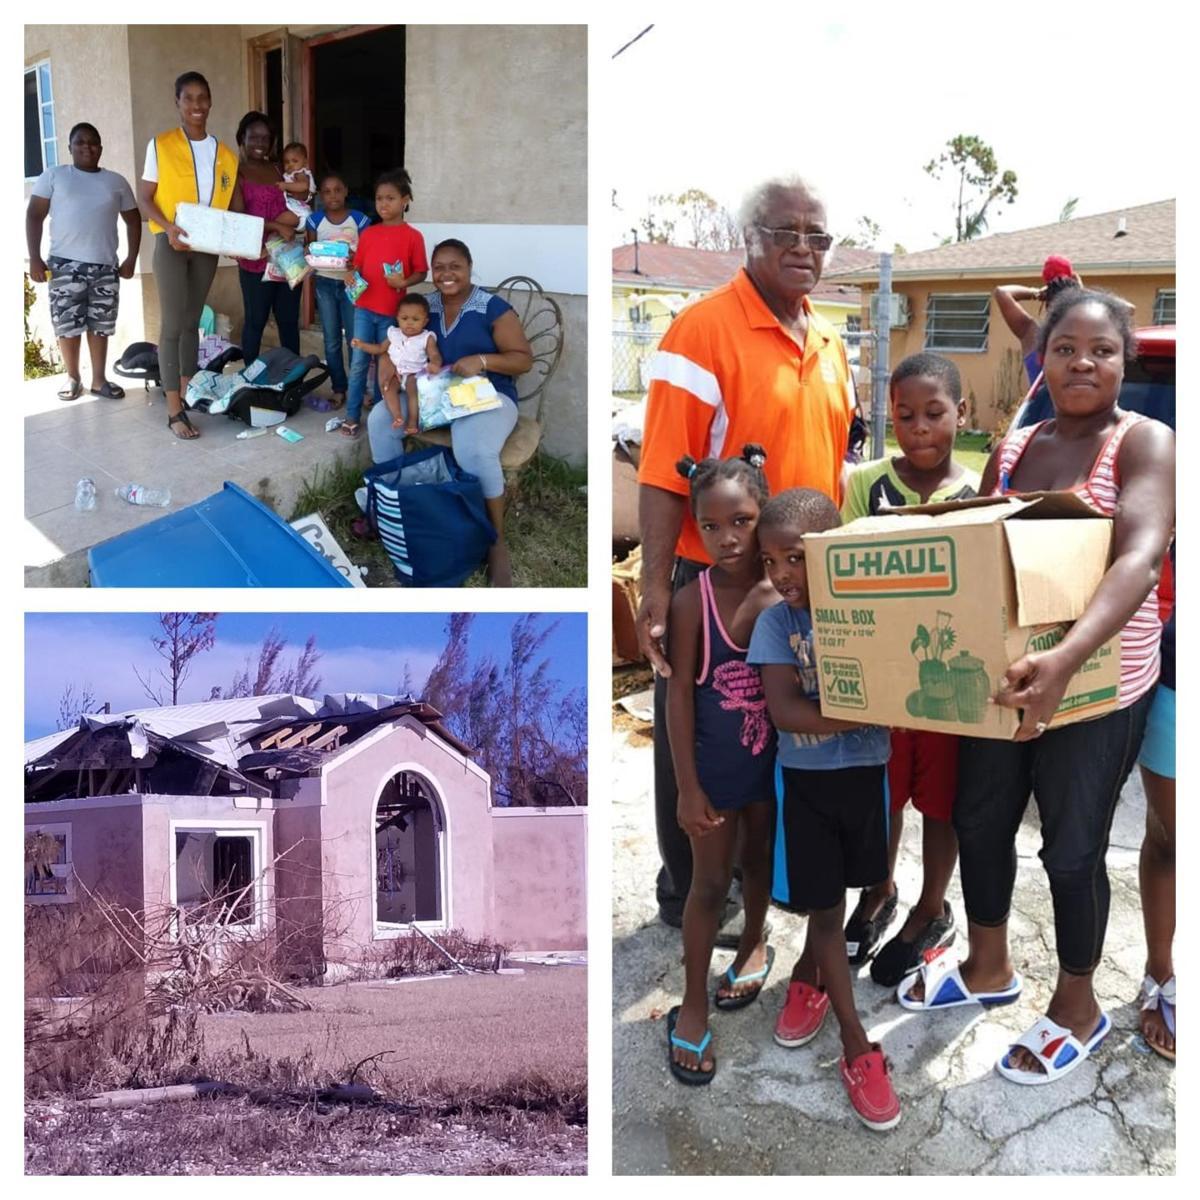 Lions Club aids Bahamas